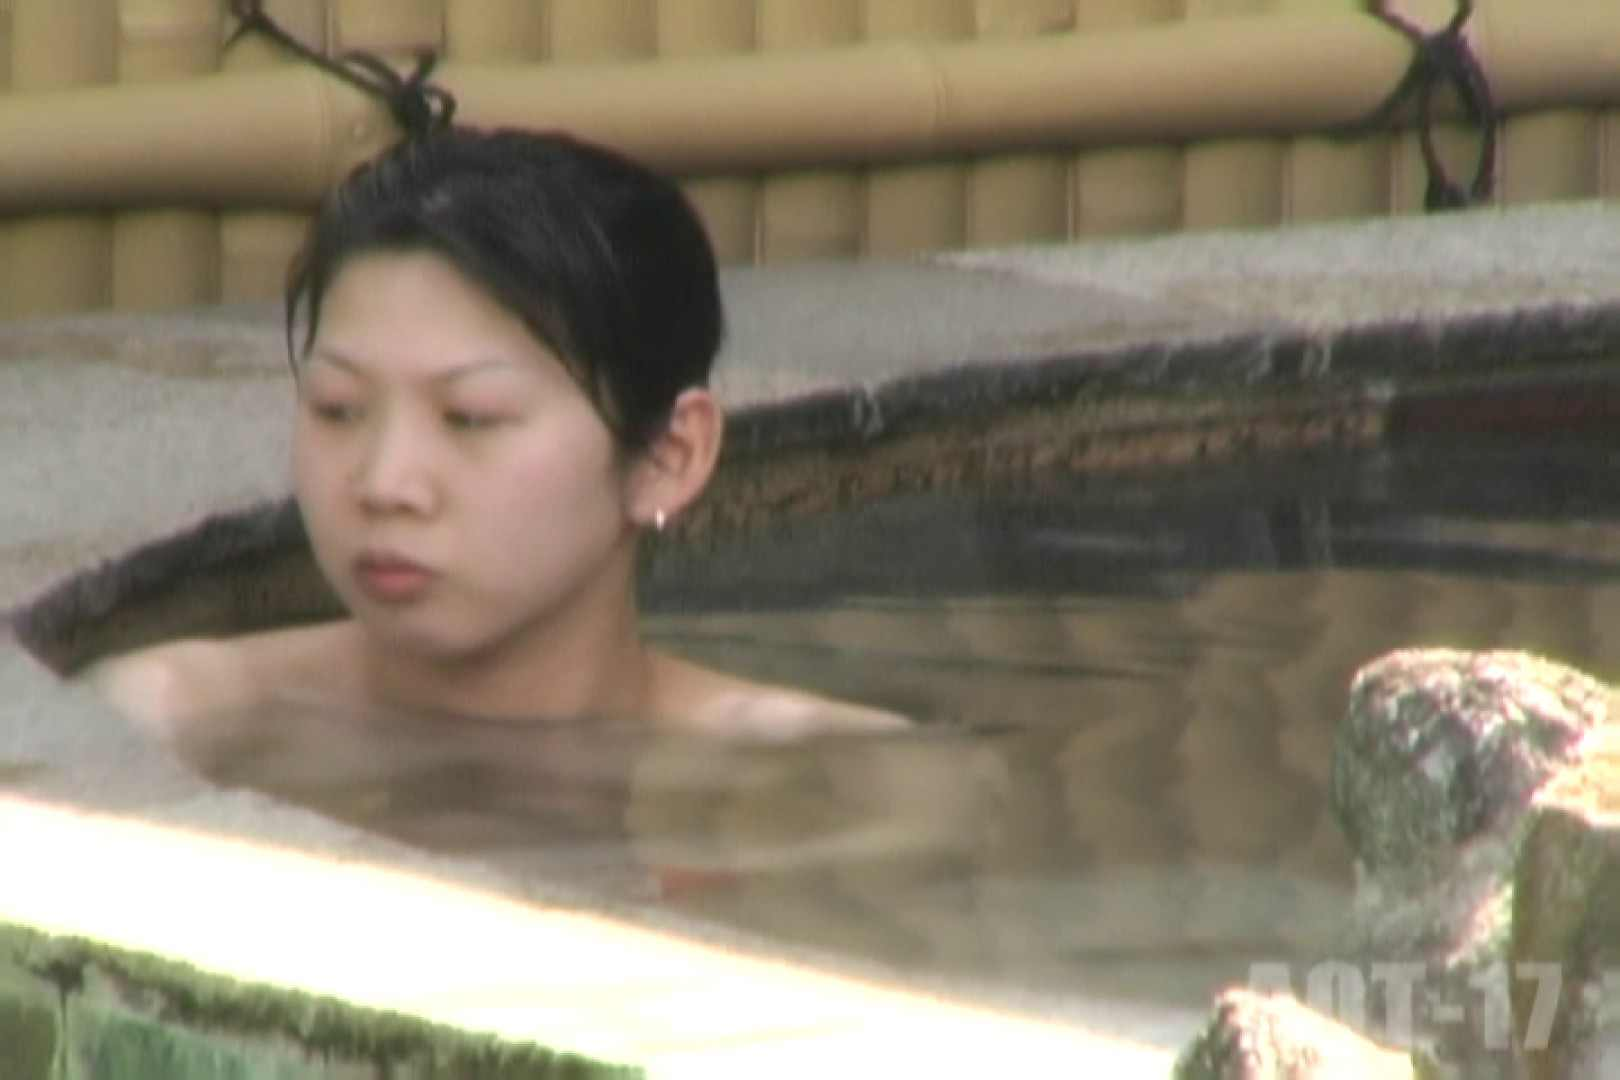 Aquaな露天風呂Vol.850 盗撮シリーズ | 露天風呂編  88PIX 83